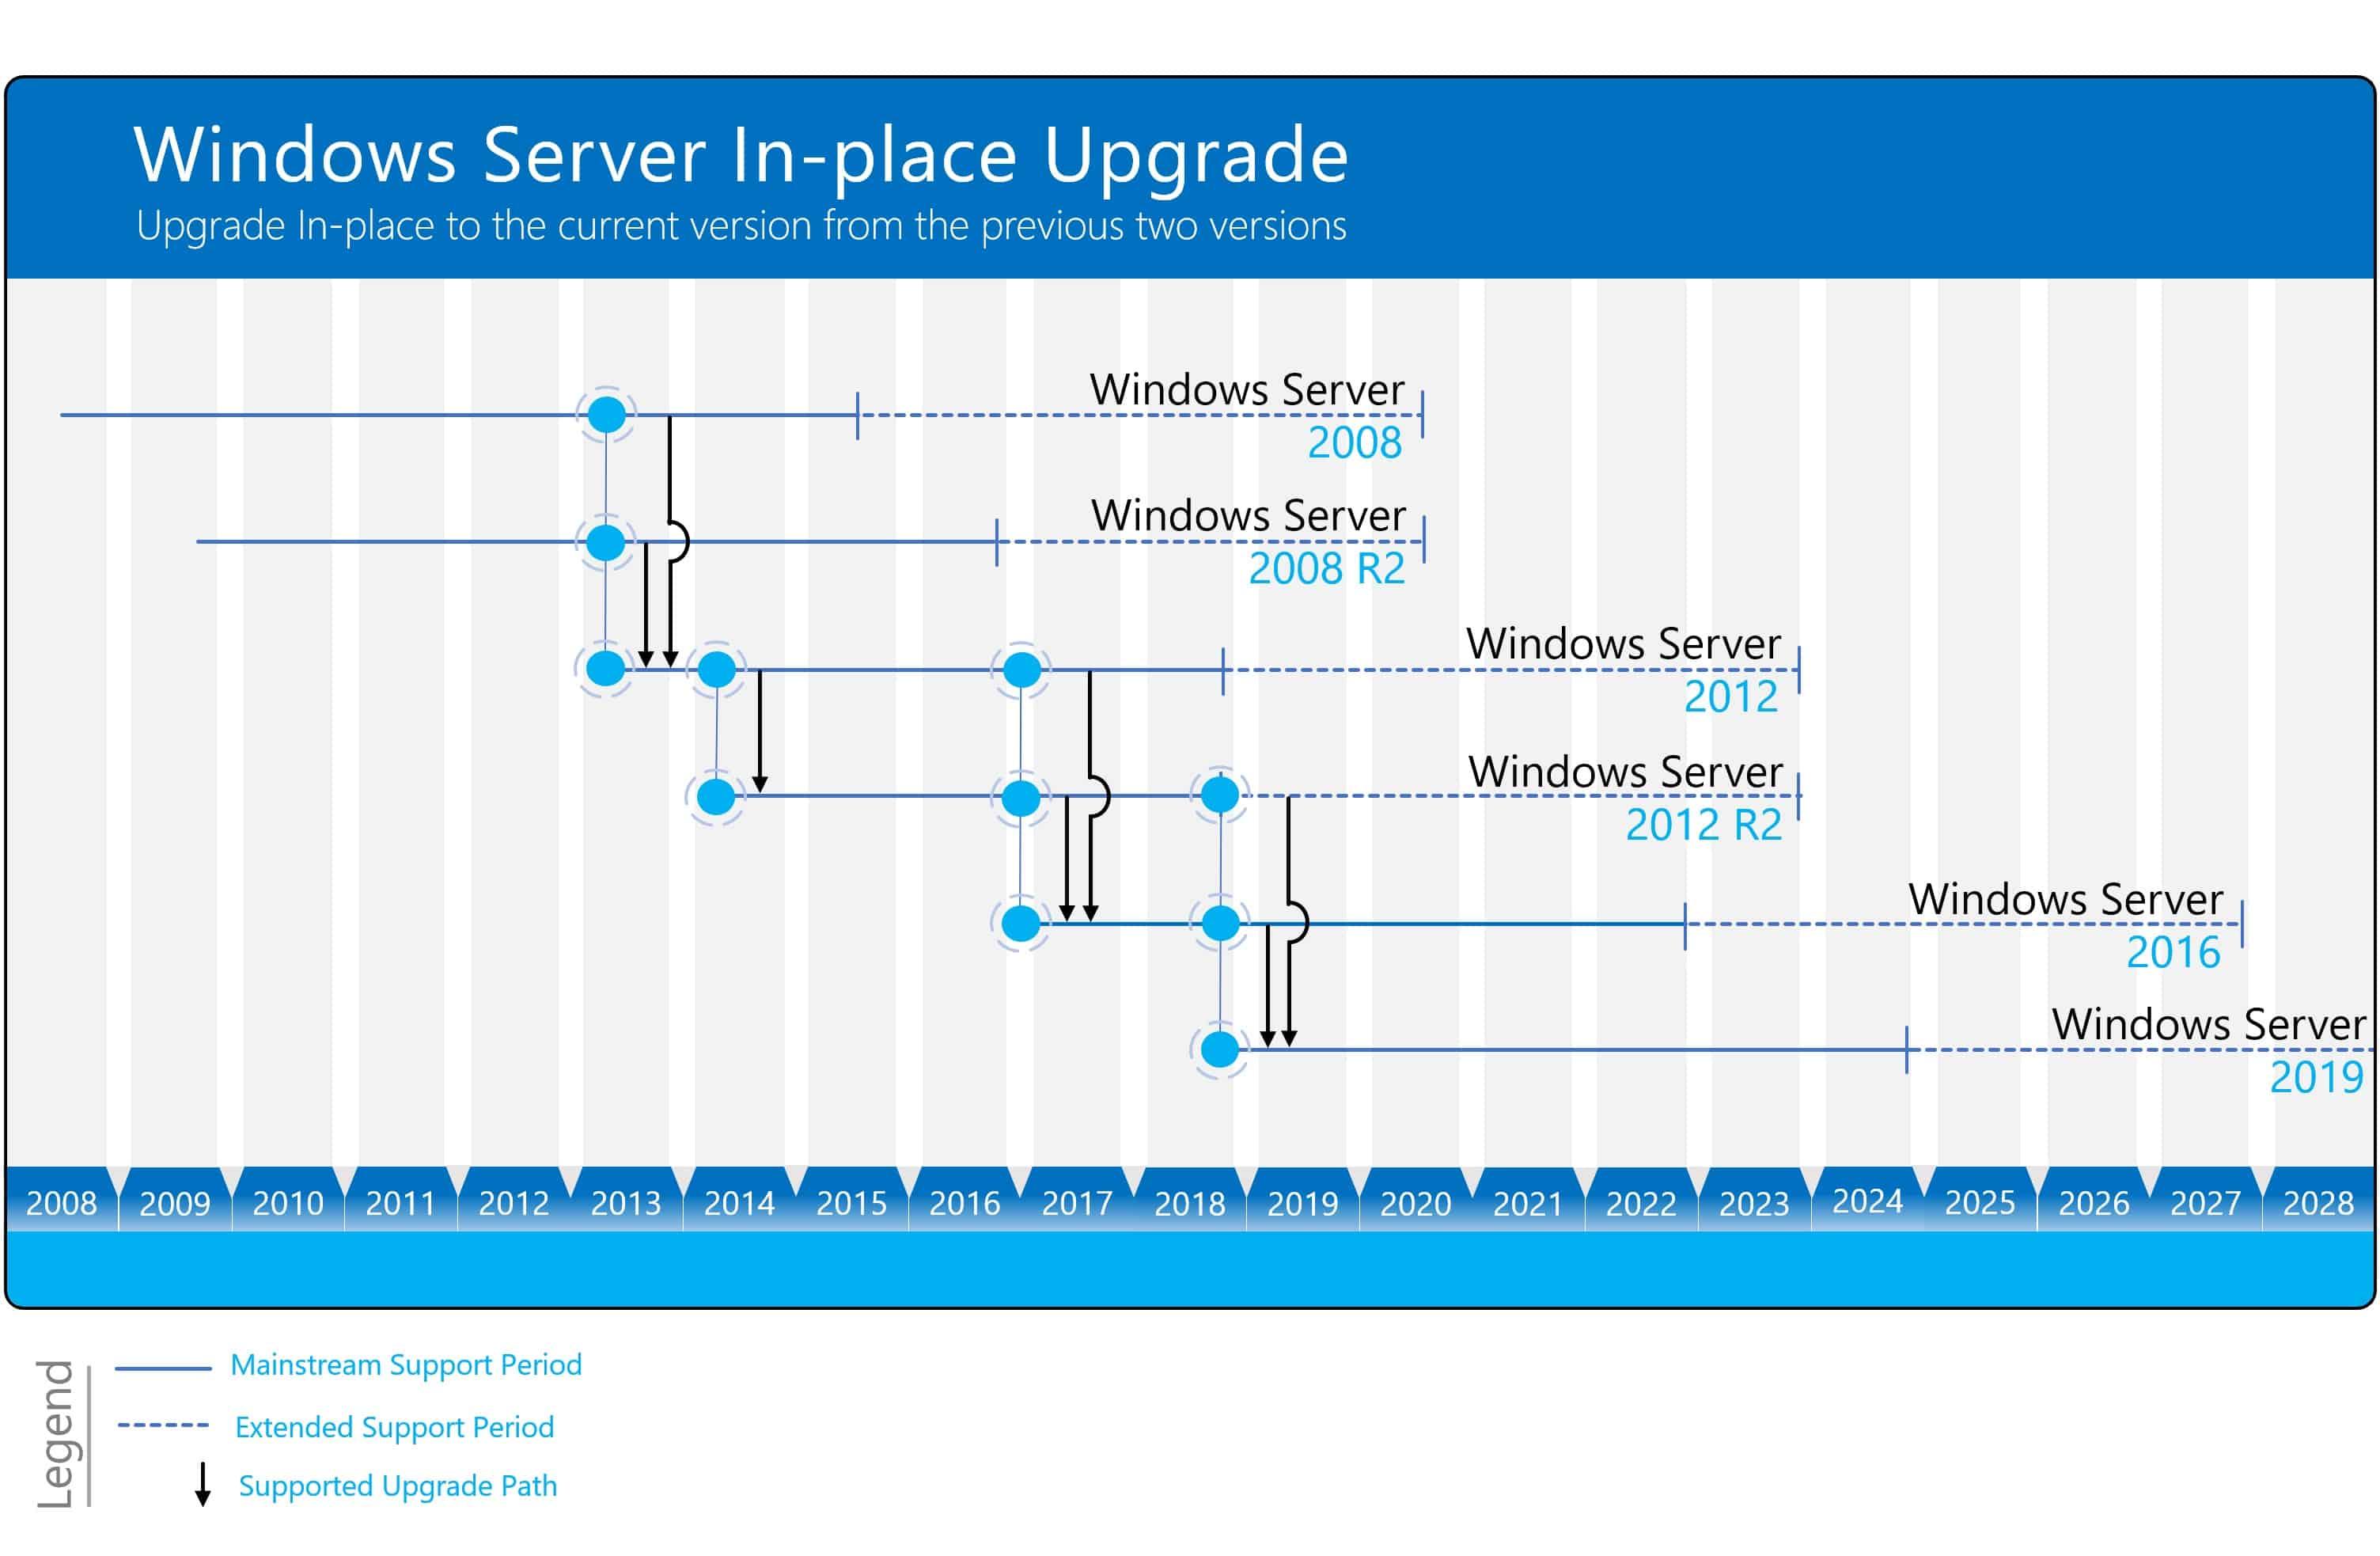 Windows Server 2019 In-place Upgrade - Thomas Maurer